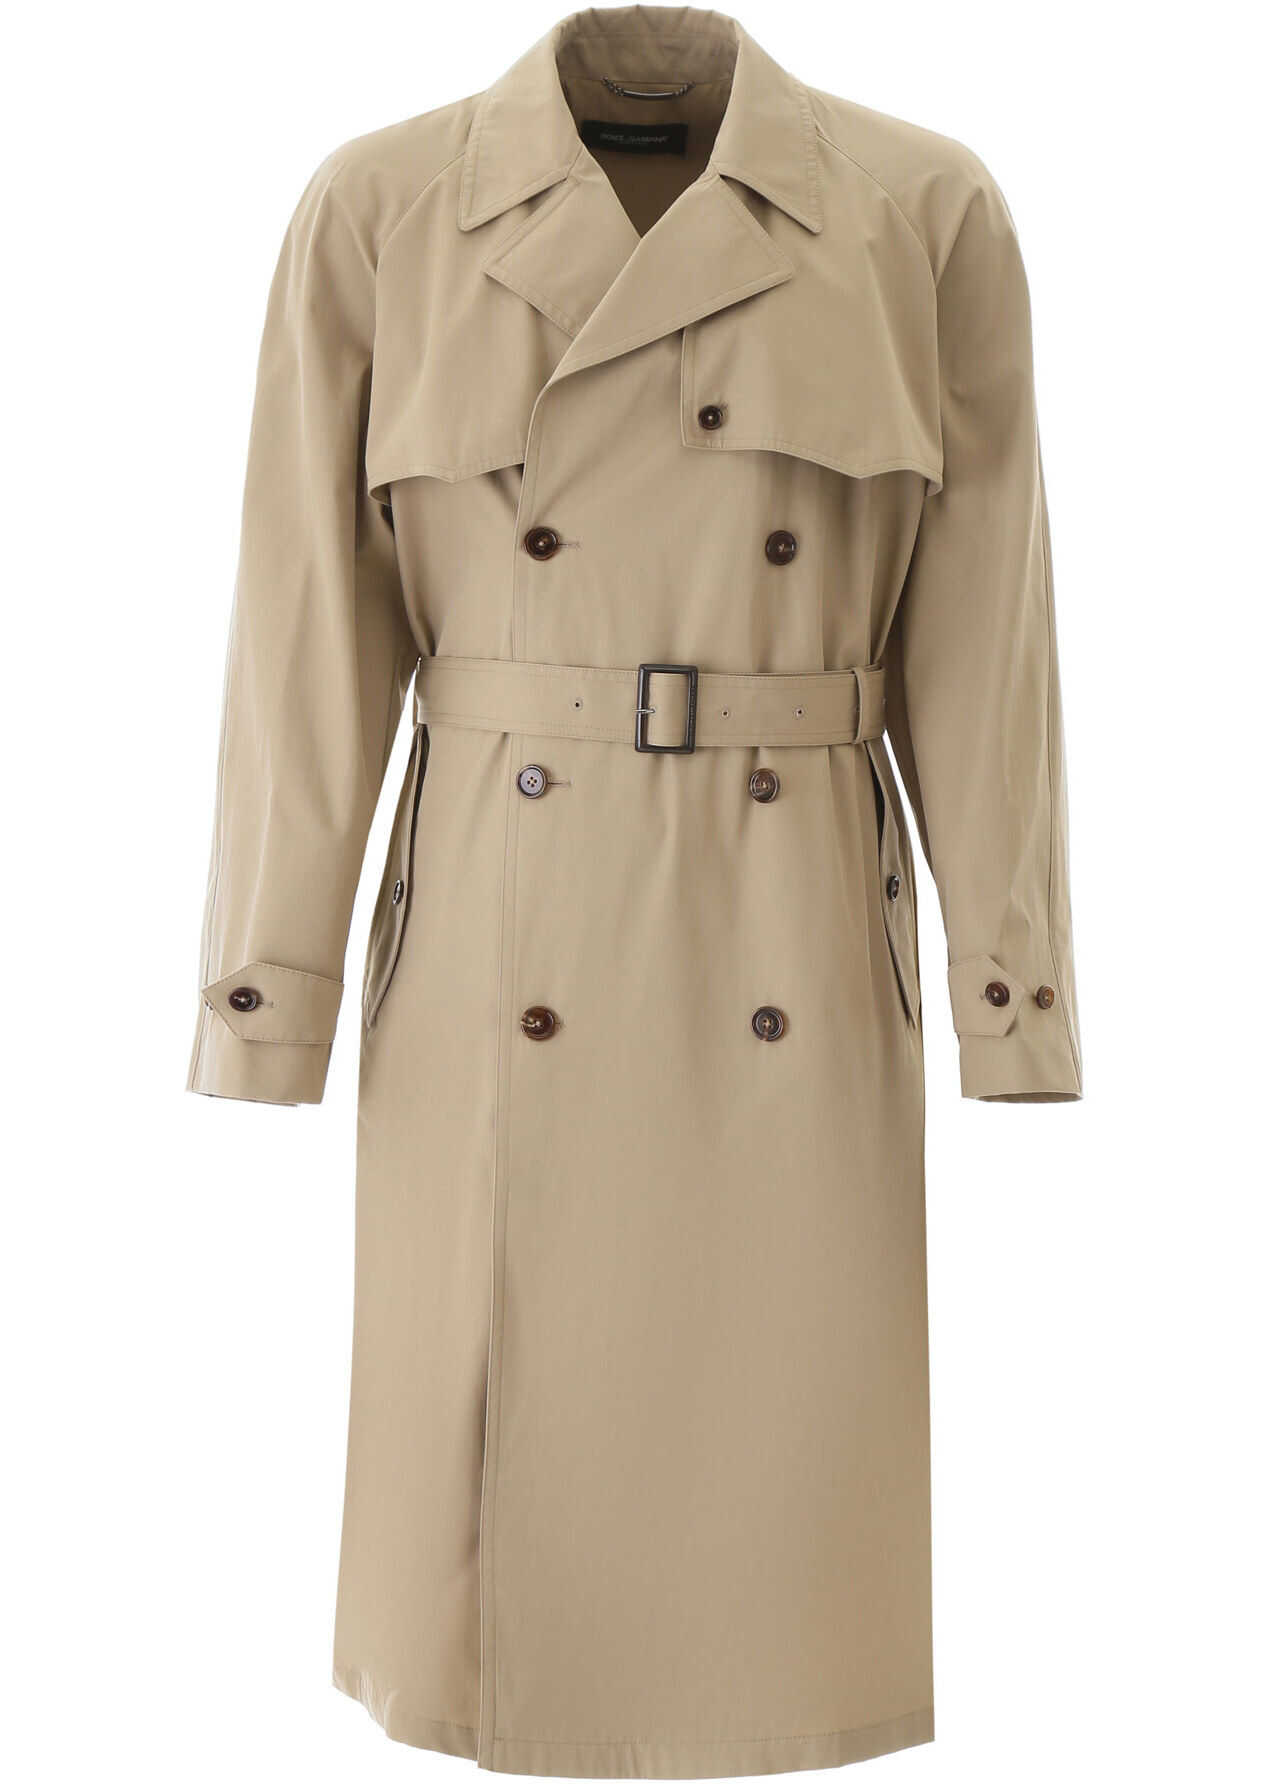 Dolce & Gabbana Cotton Trench Coat CORDA 1 imagine